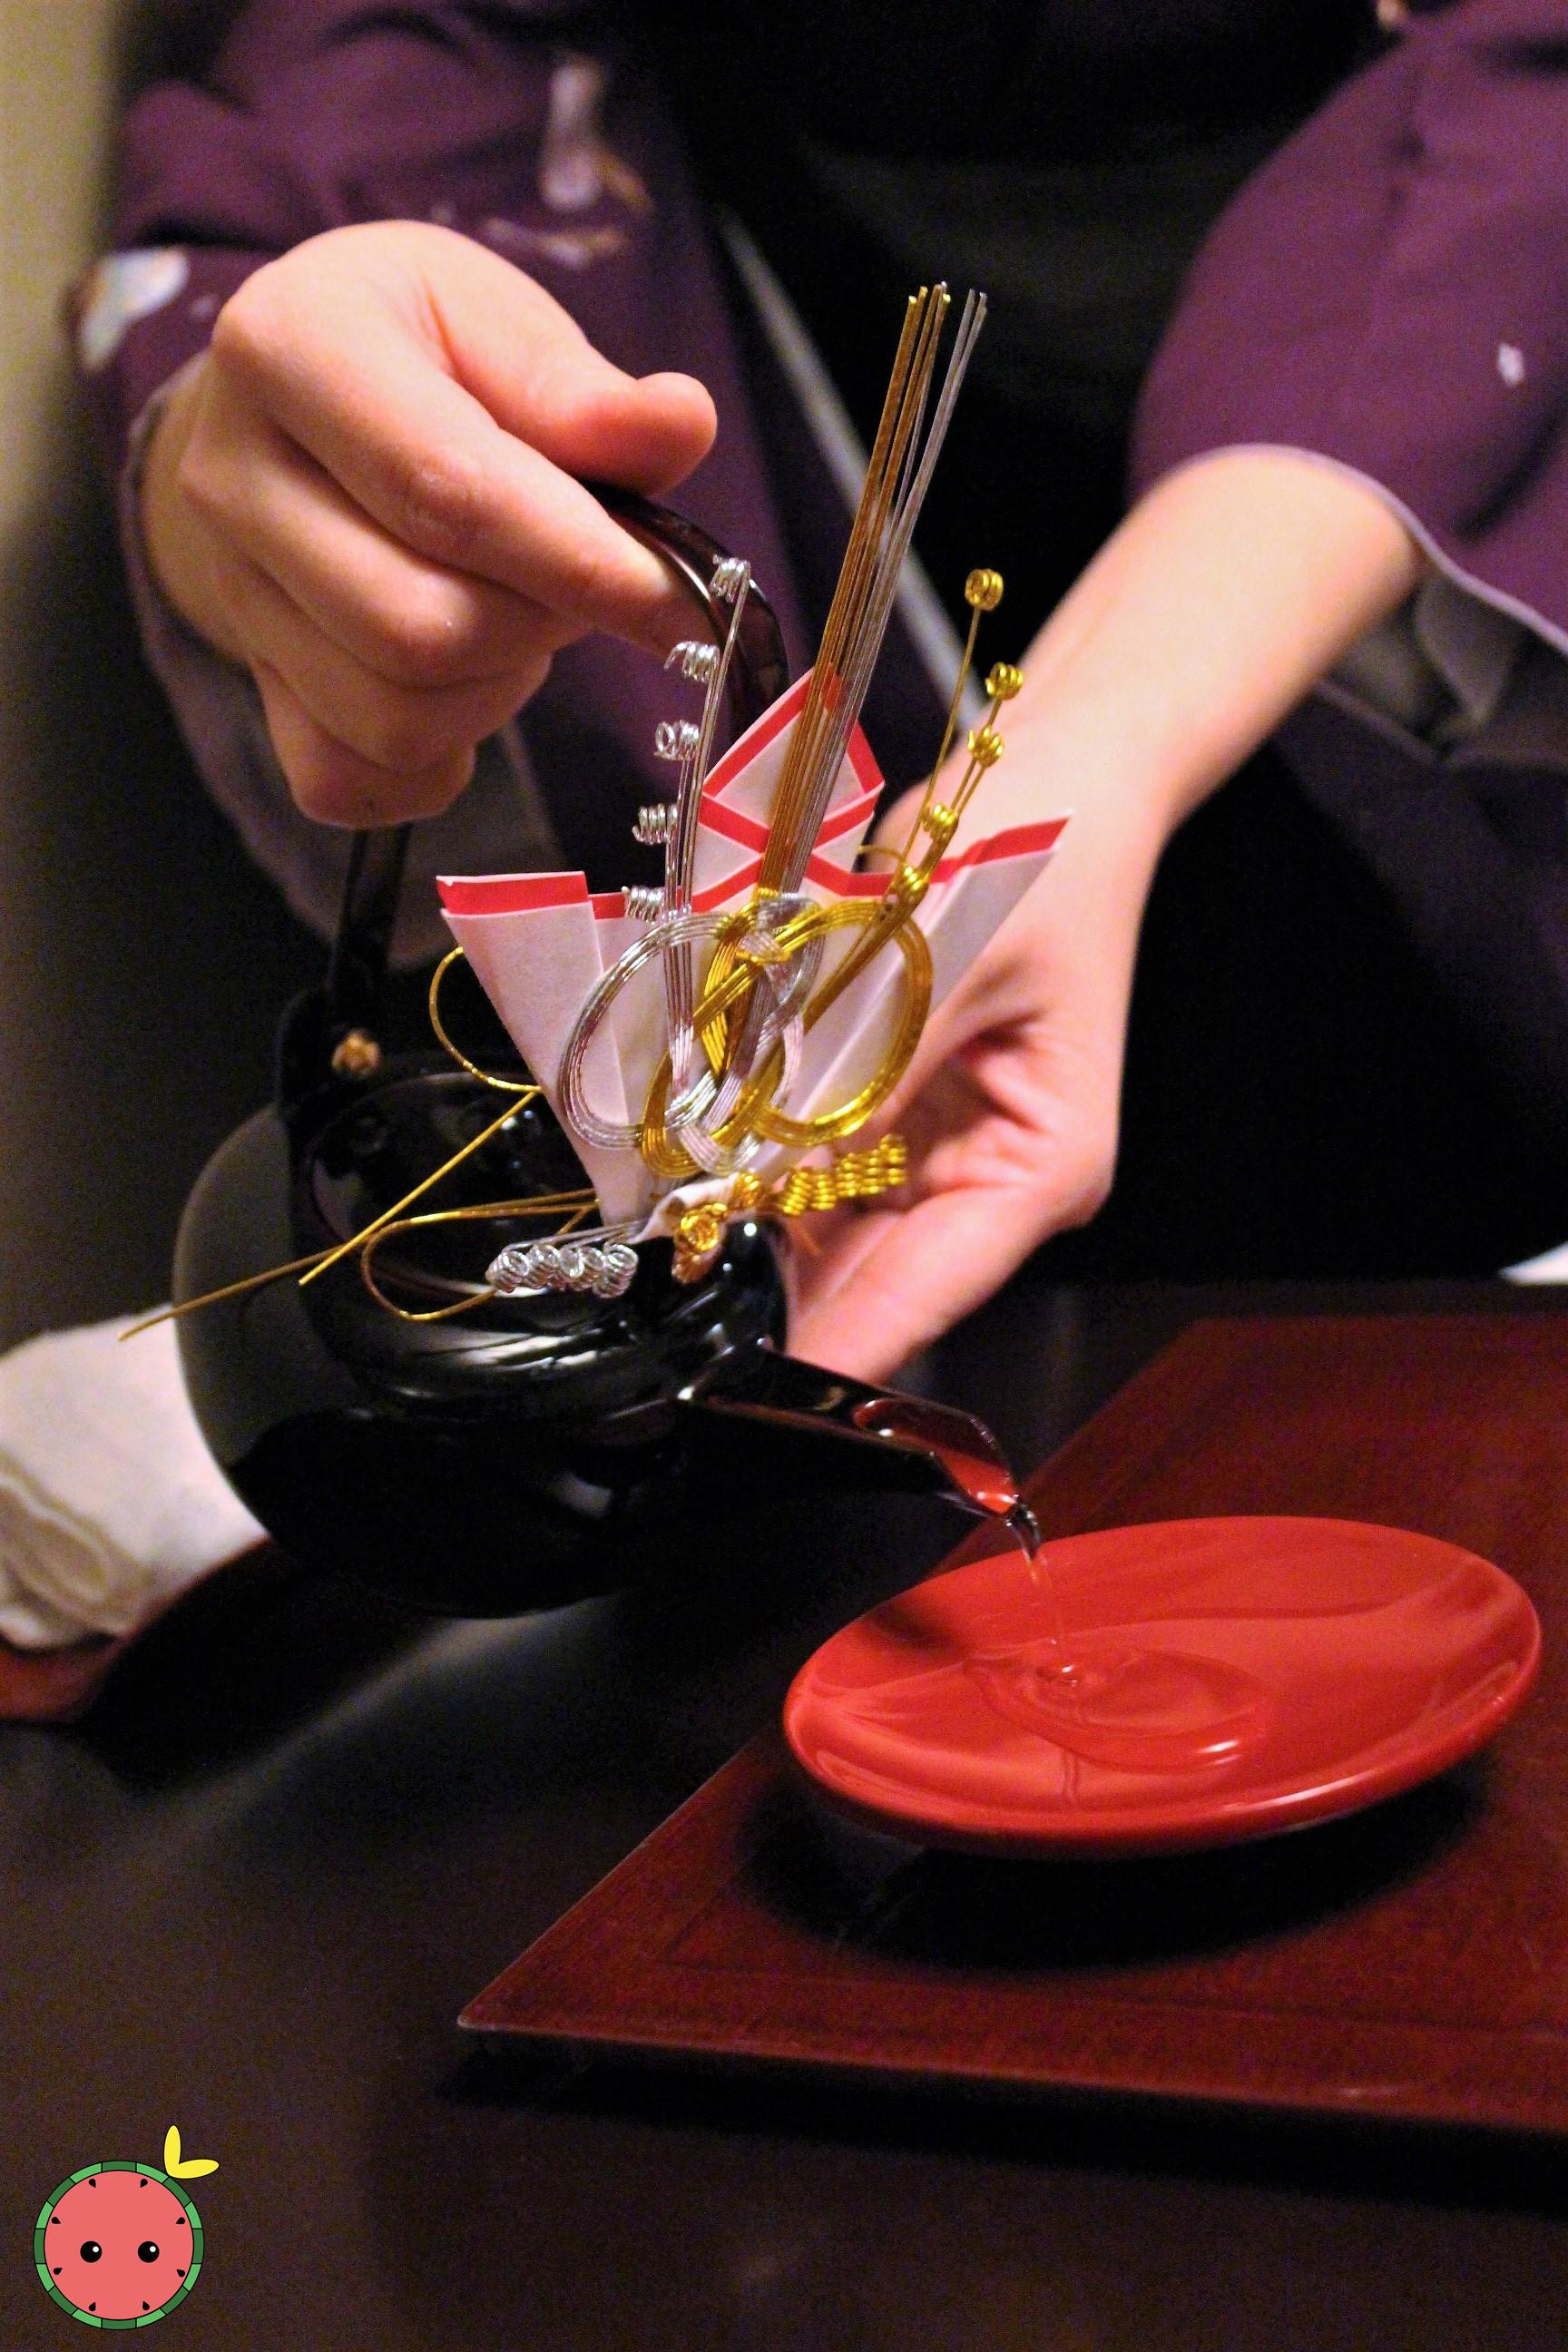 Pouring Isojiman Ginjo Genshu Sake